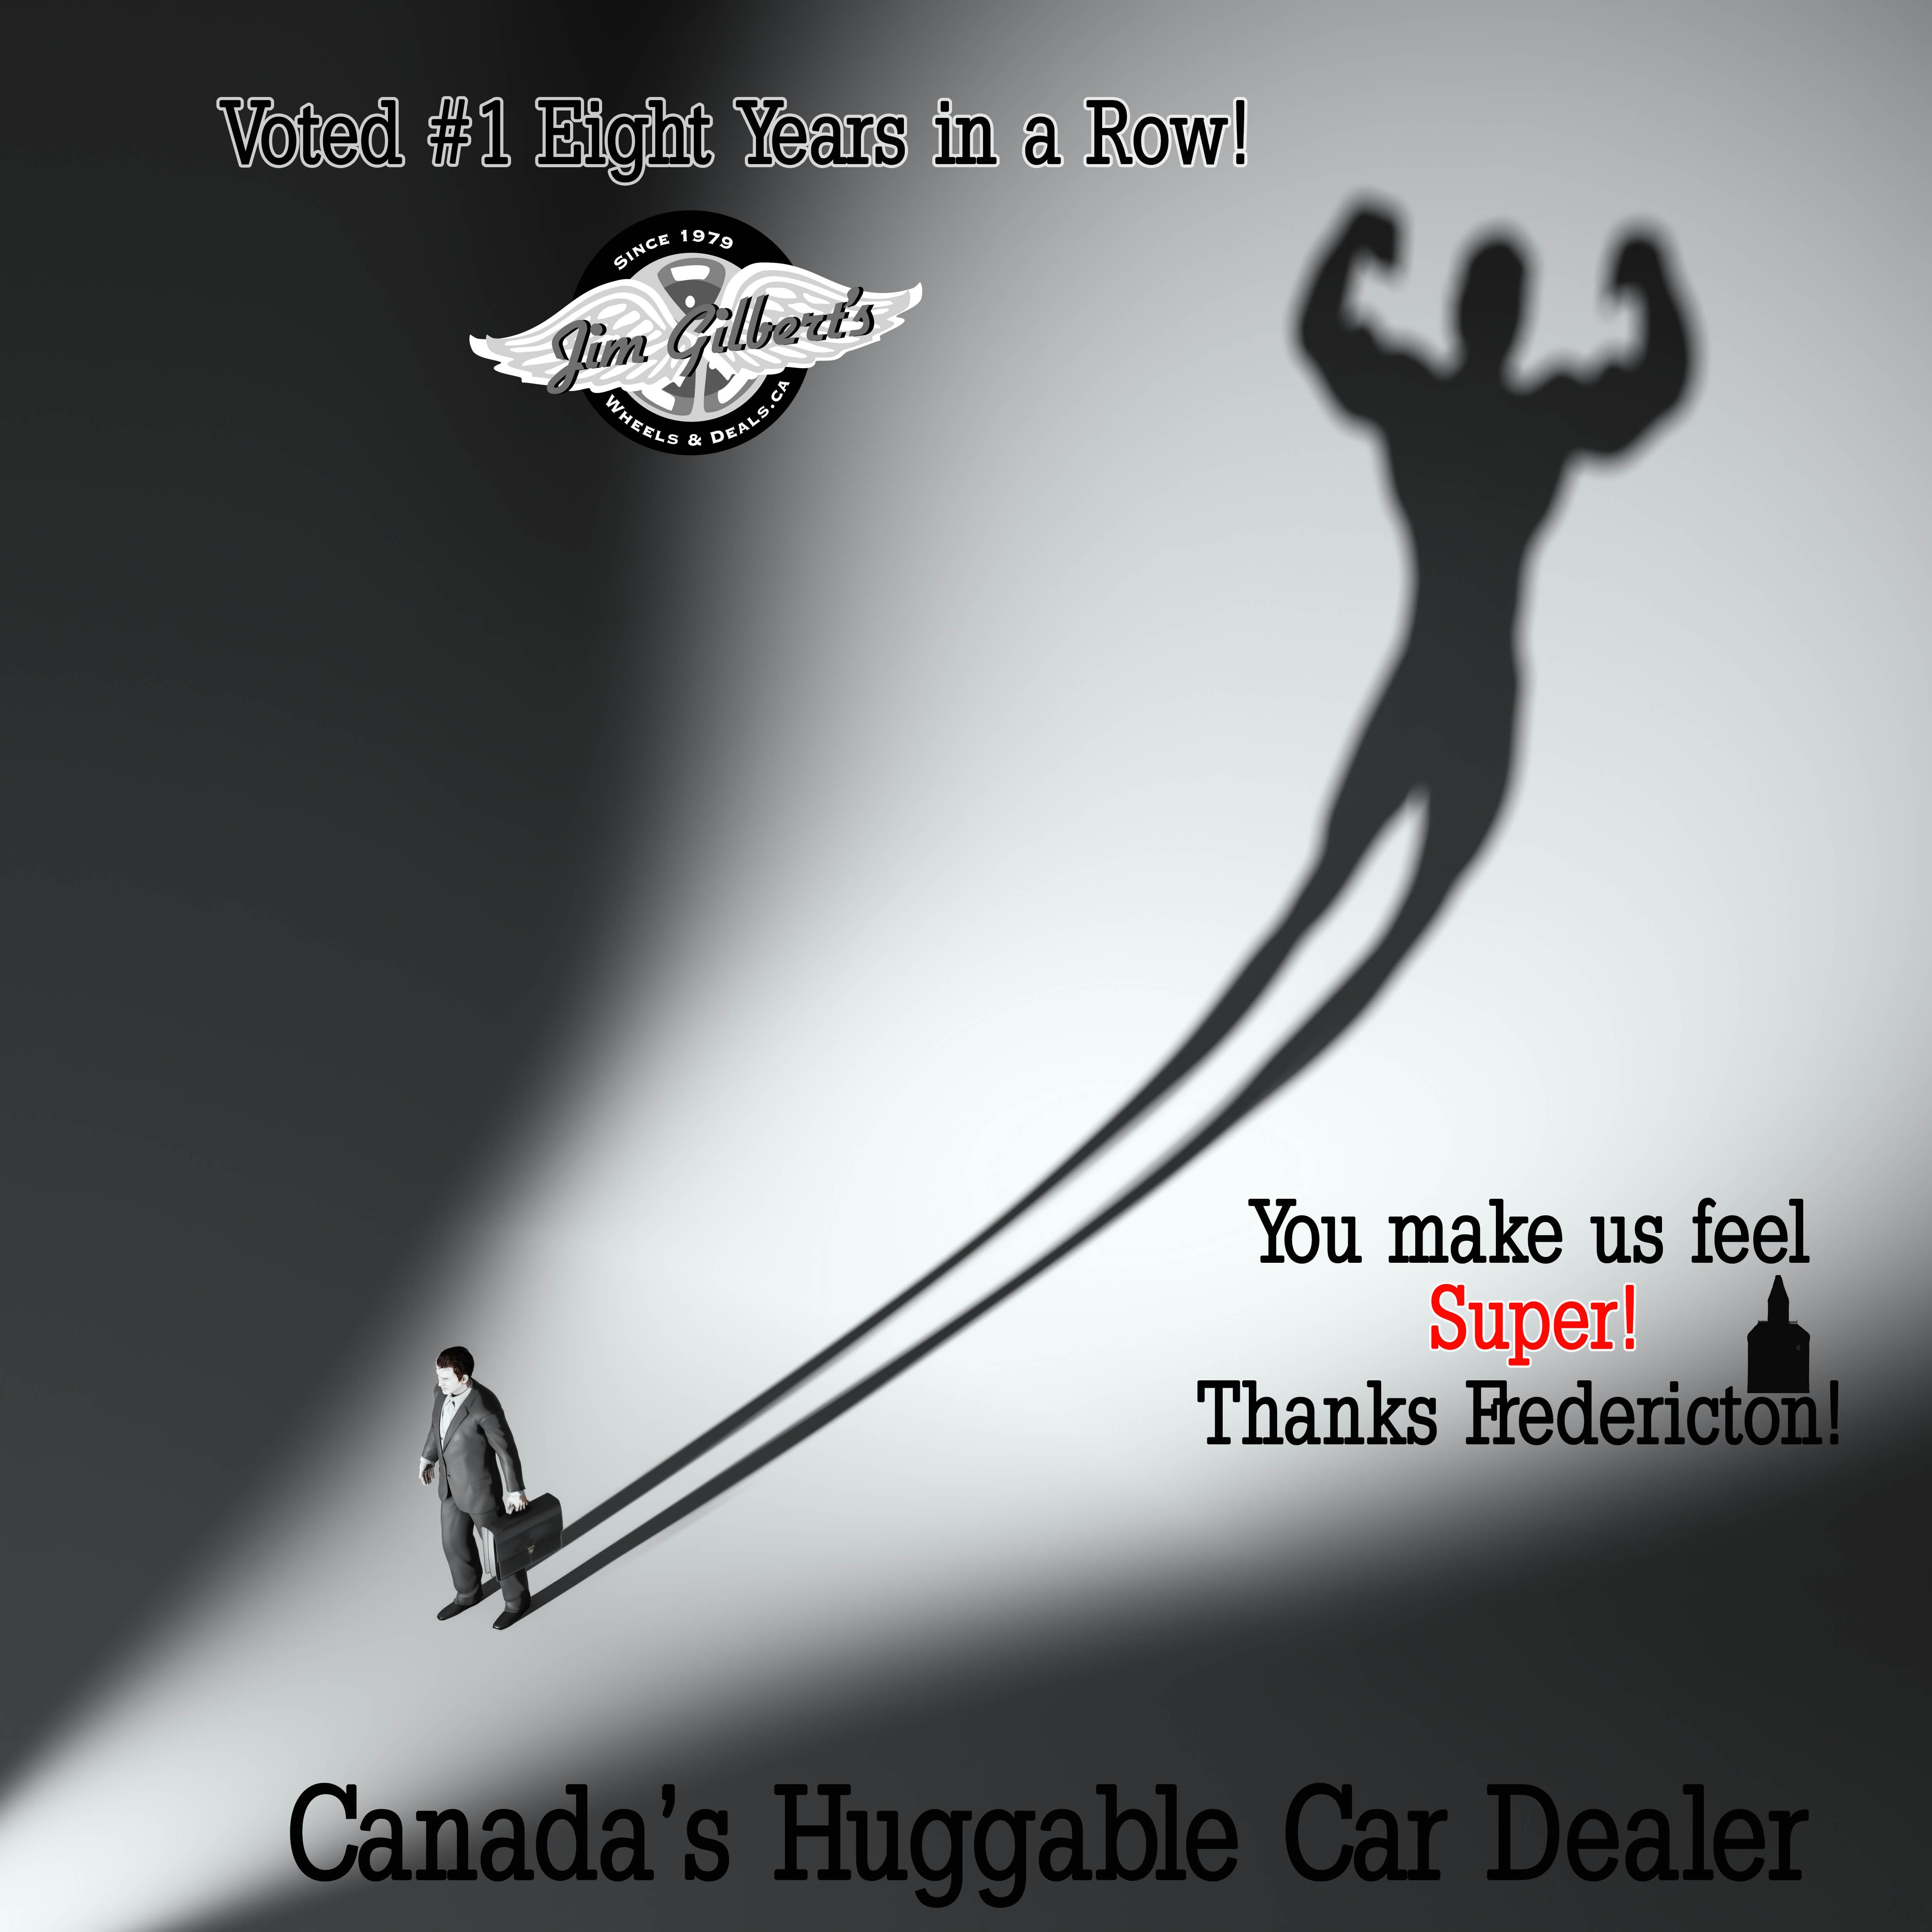 Jim Gilbert S Wheels And Deals Canada S Huggable Car Dealer